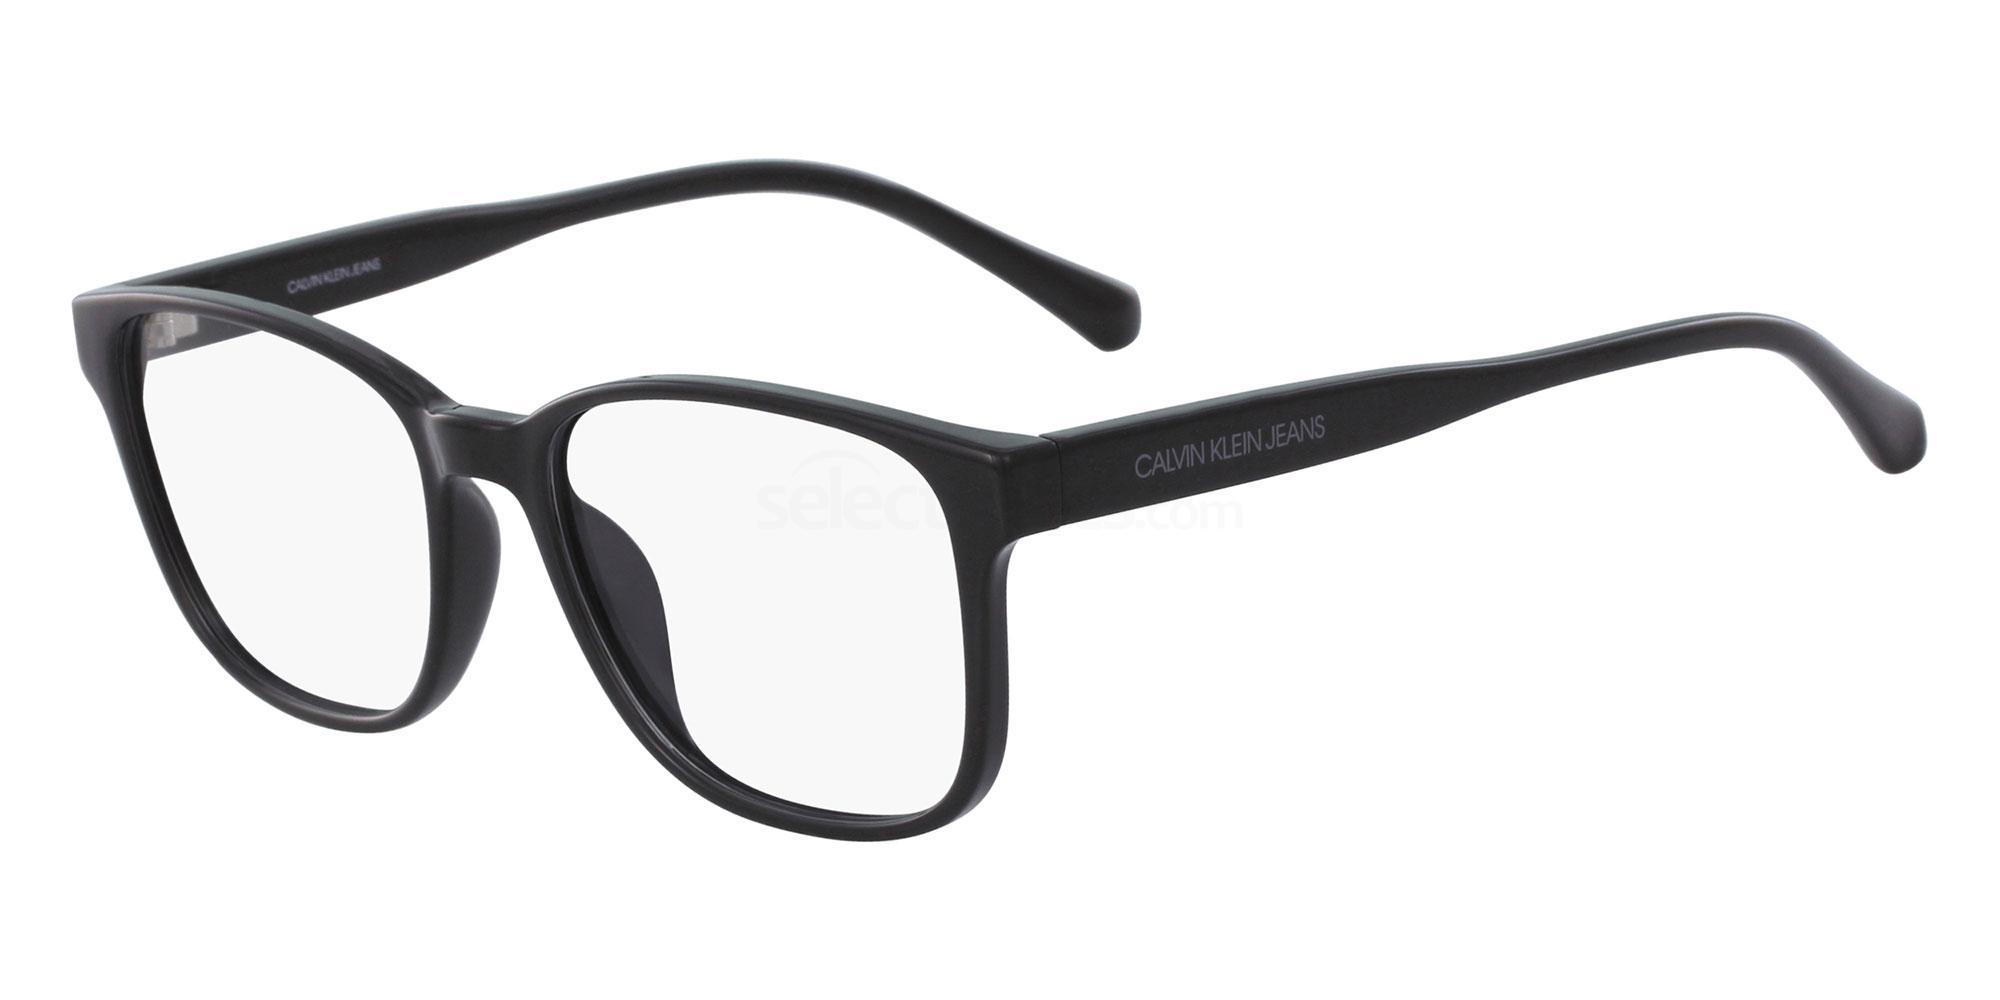 001 CKJ19507 Glasses, Calvin Klein Jeans